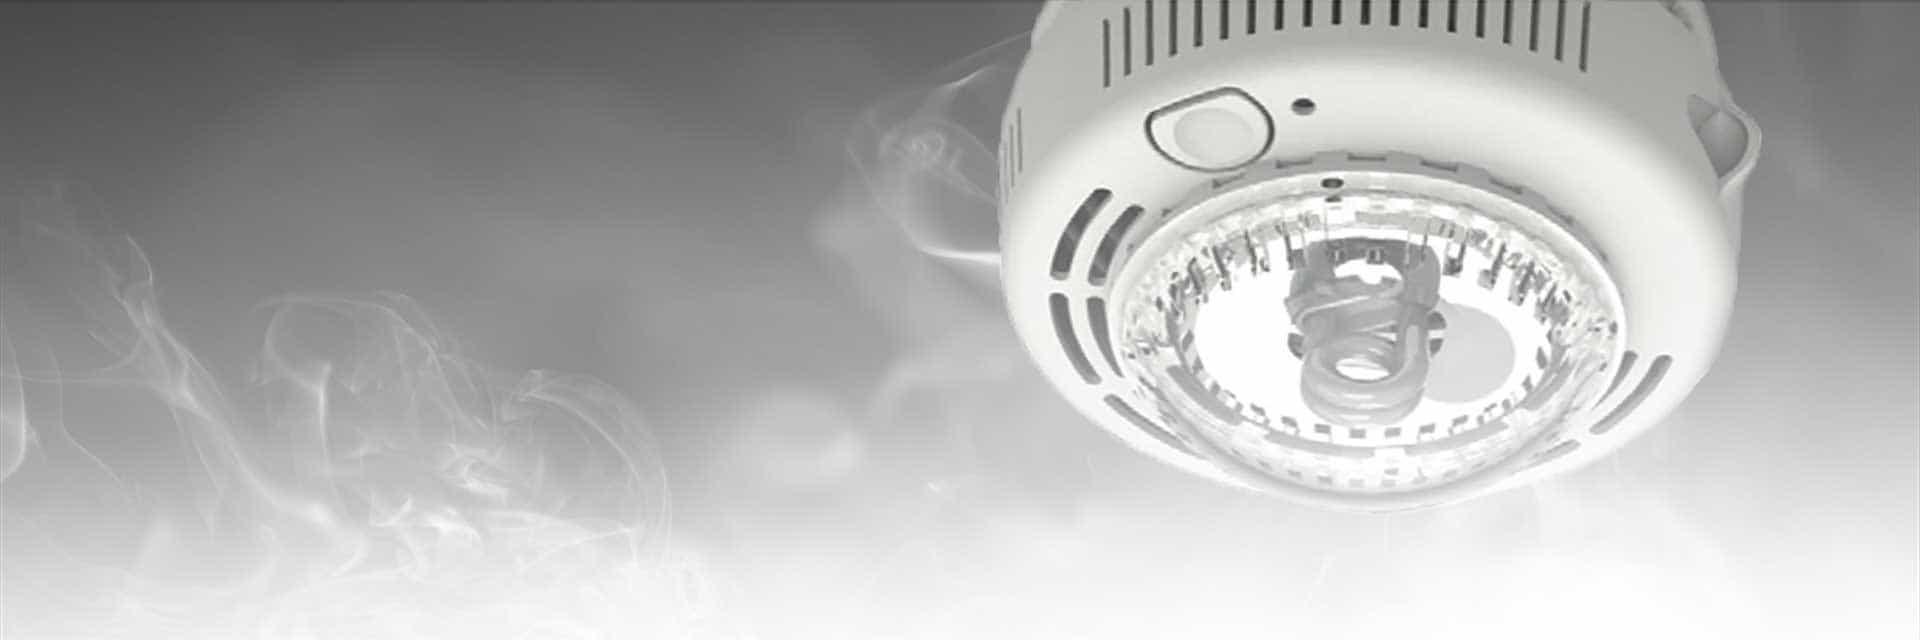 Smoke Control banner image. Smoke alarm on ceiling with white smoke rising towards it.